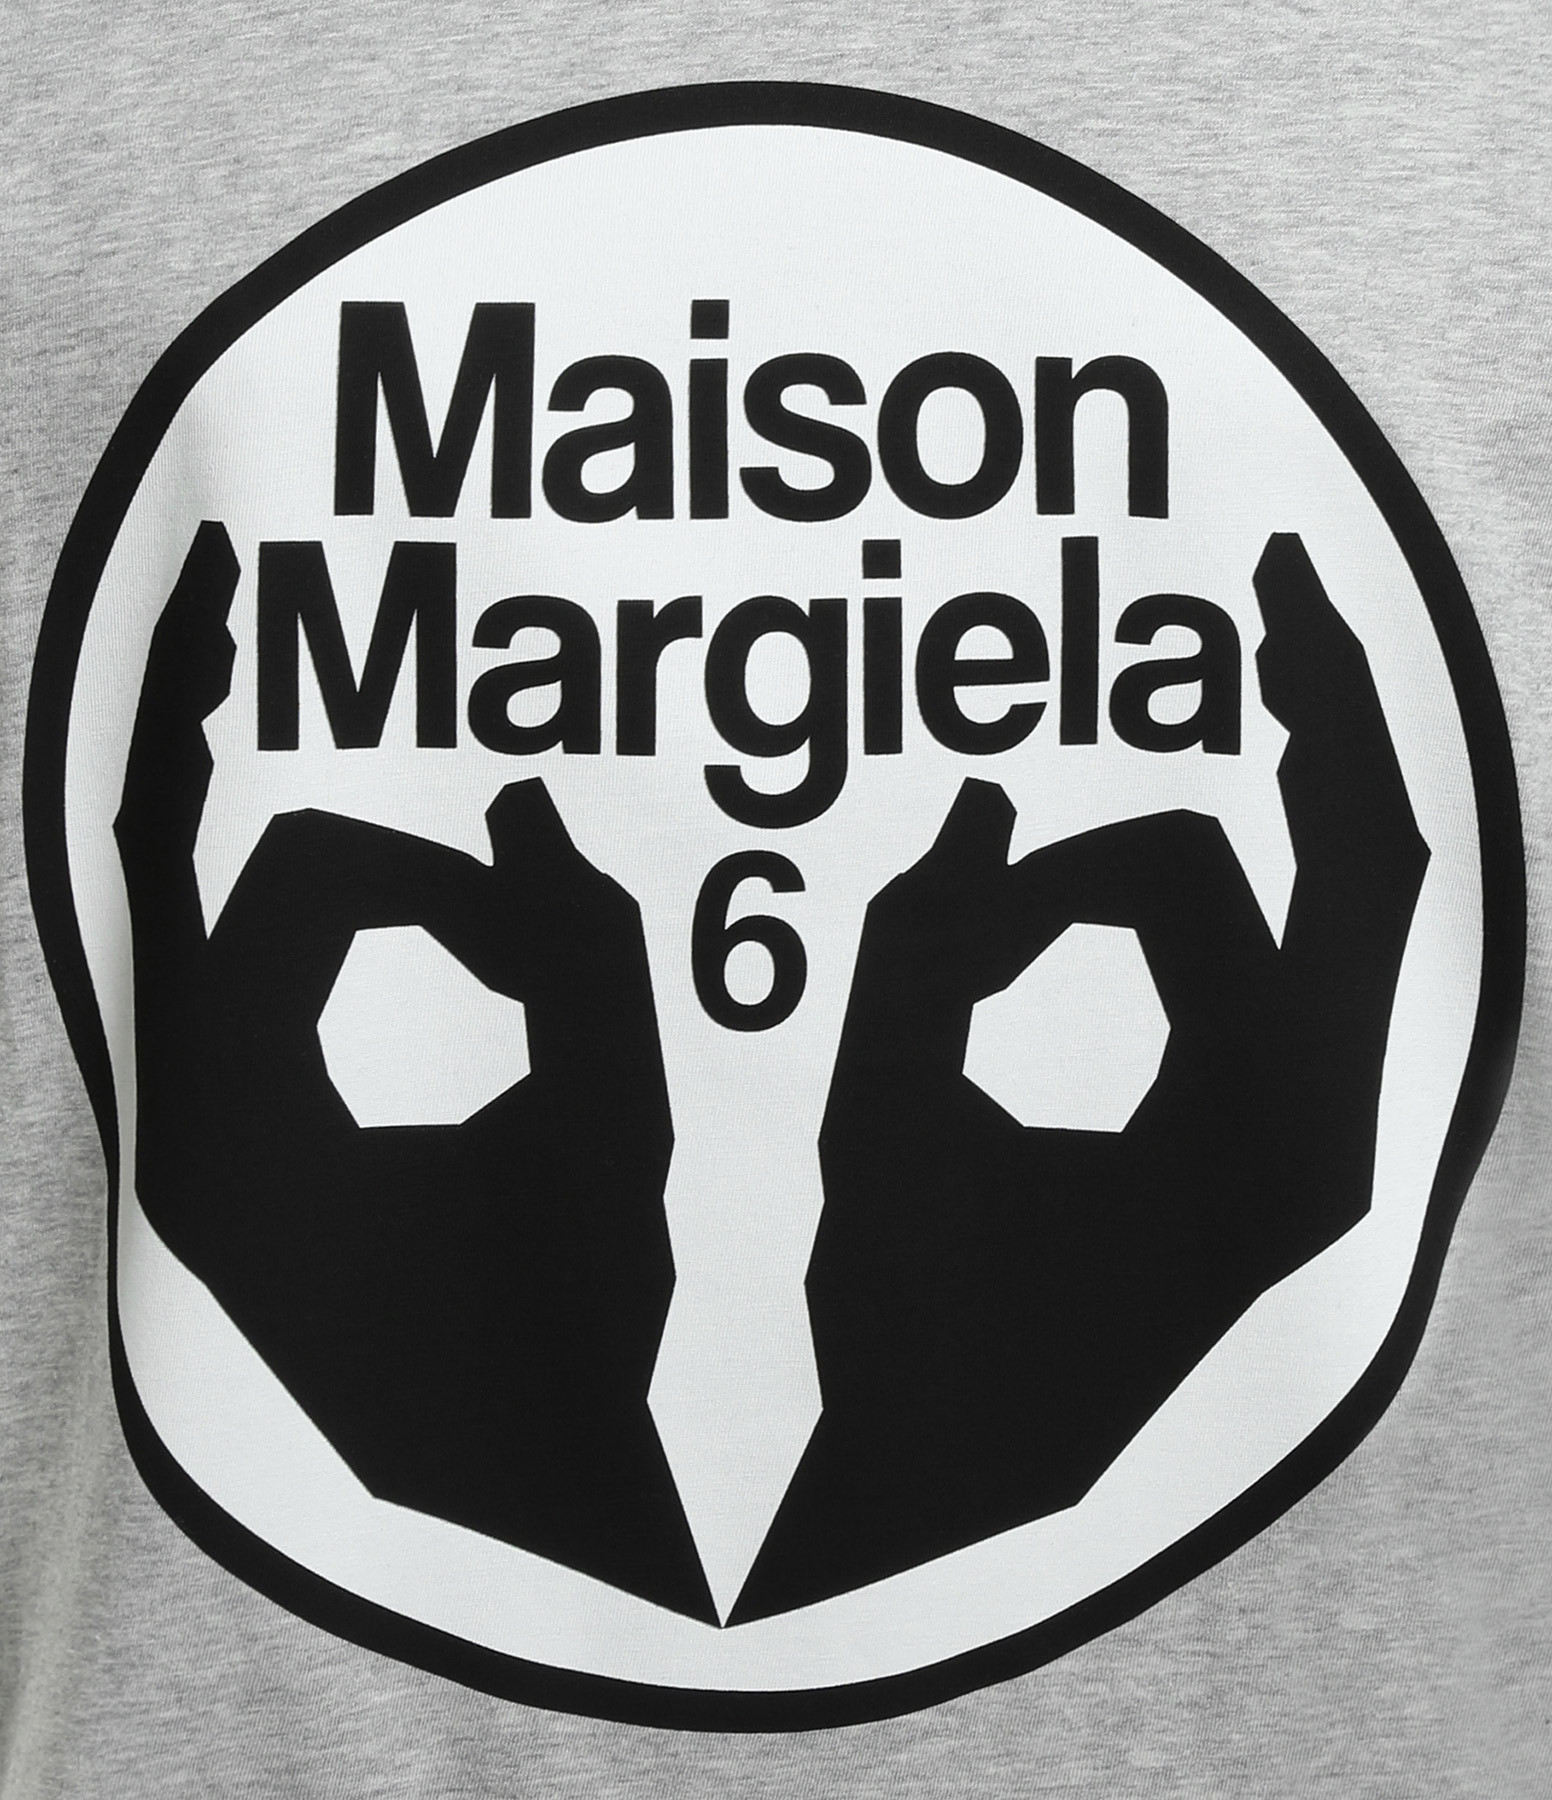 MM6 MAISON MARGIELA - Tee-shirt Basic Fitted Coton Gris Chiné